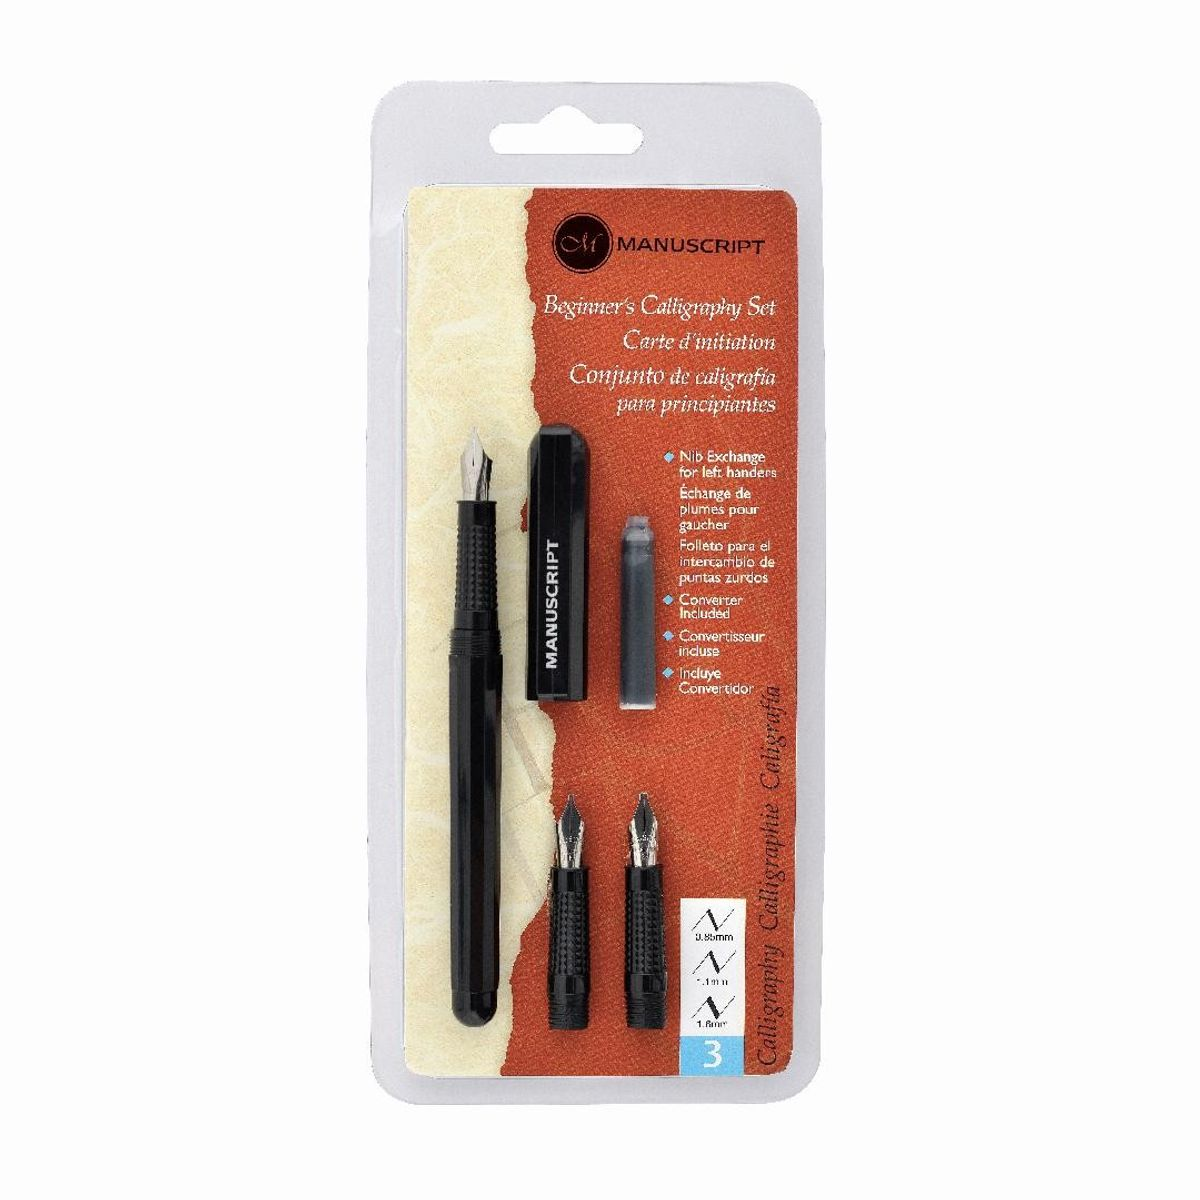 Manuscript Beginner 39 S Calligraphy Fountain Pen Set